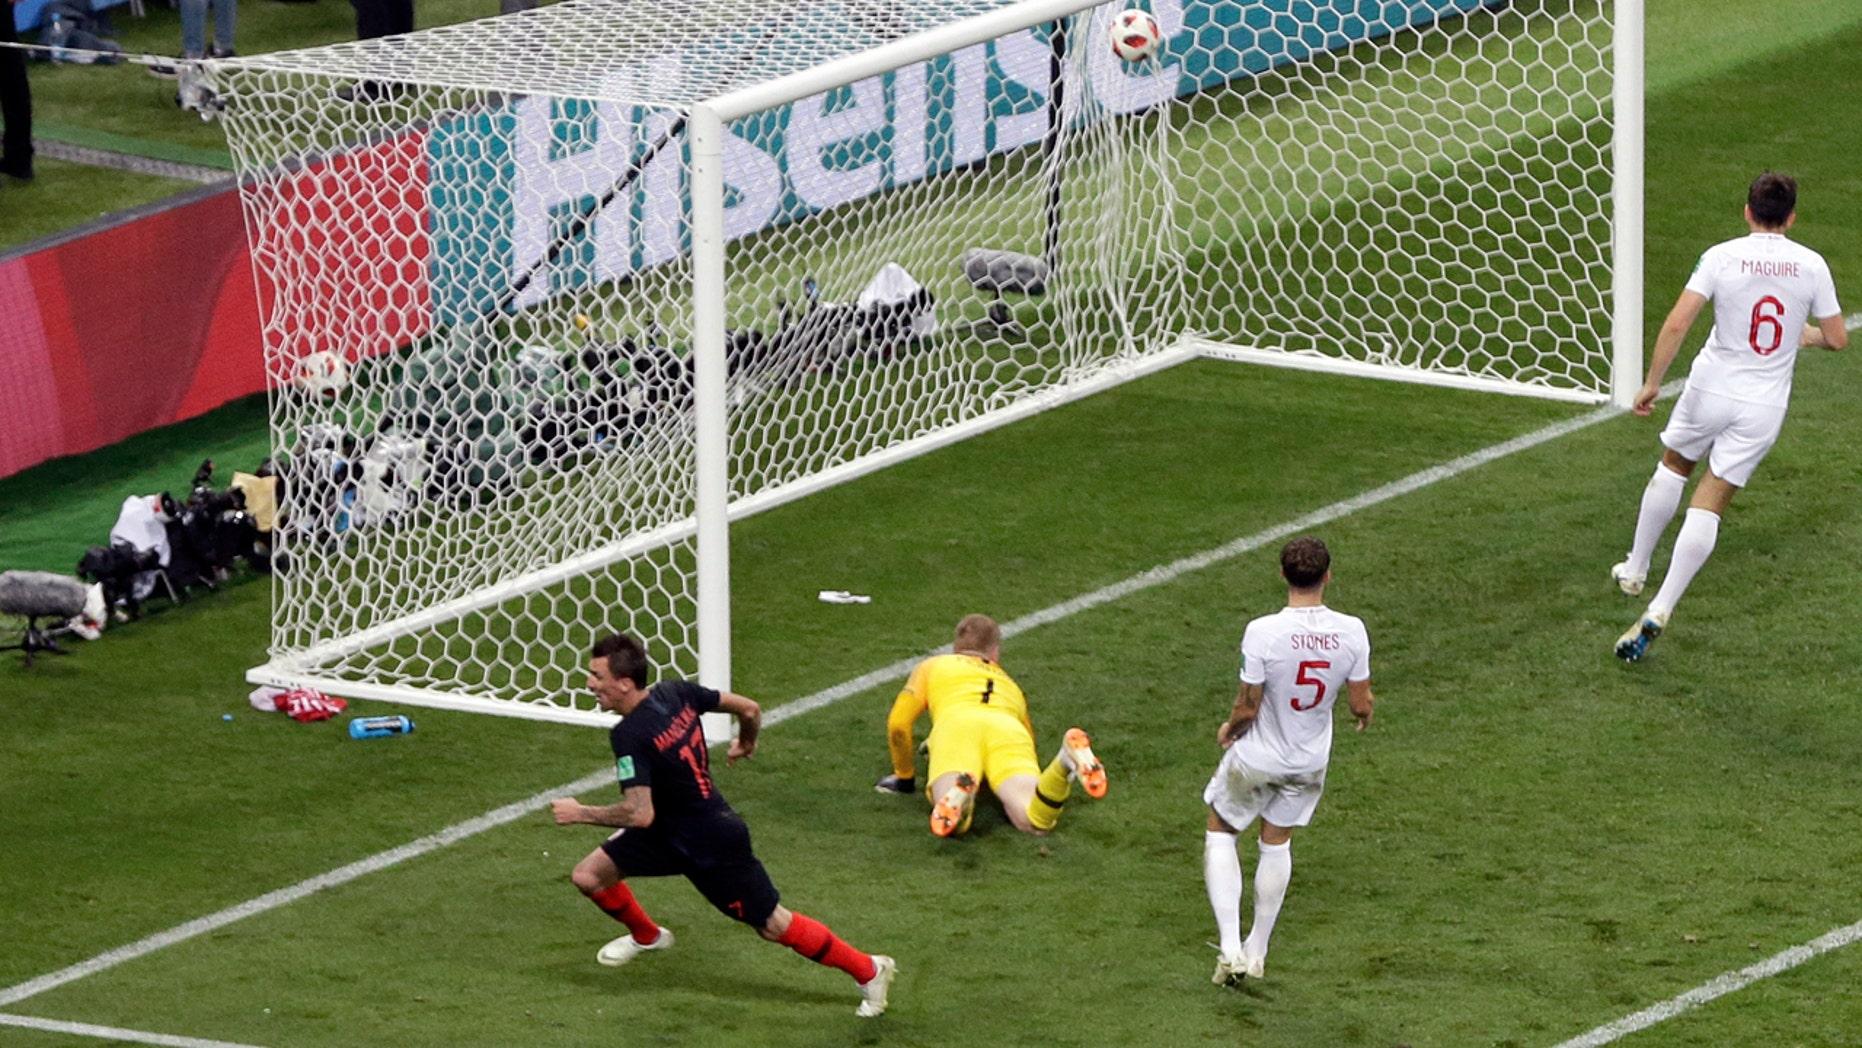 Mario Mandzukic wheels away after scoring the winning goal in Wednesday's semifinal between Croatia and England.